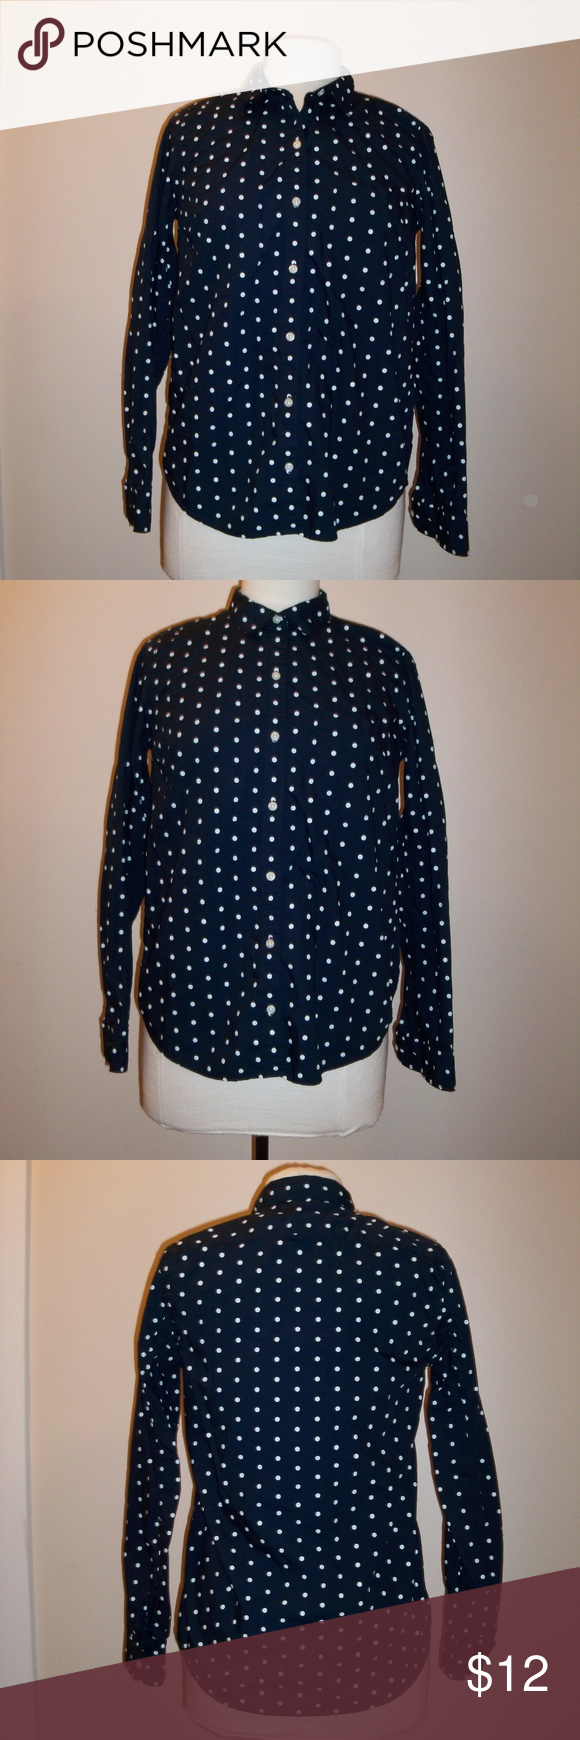 Gap Polka Dot Button Down Shirt | Clothes design, Fashion